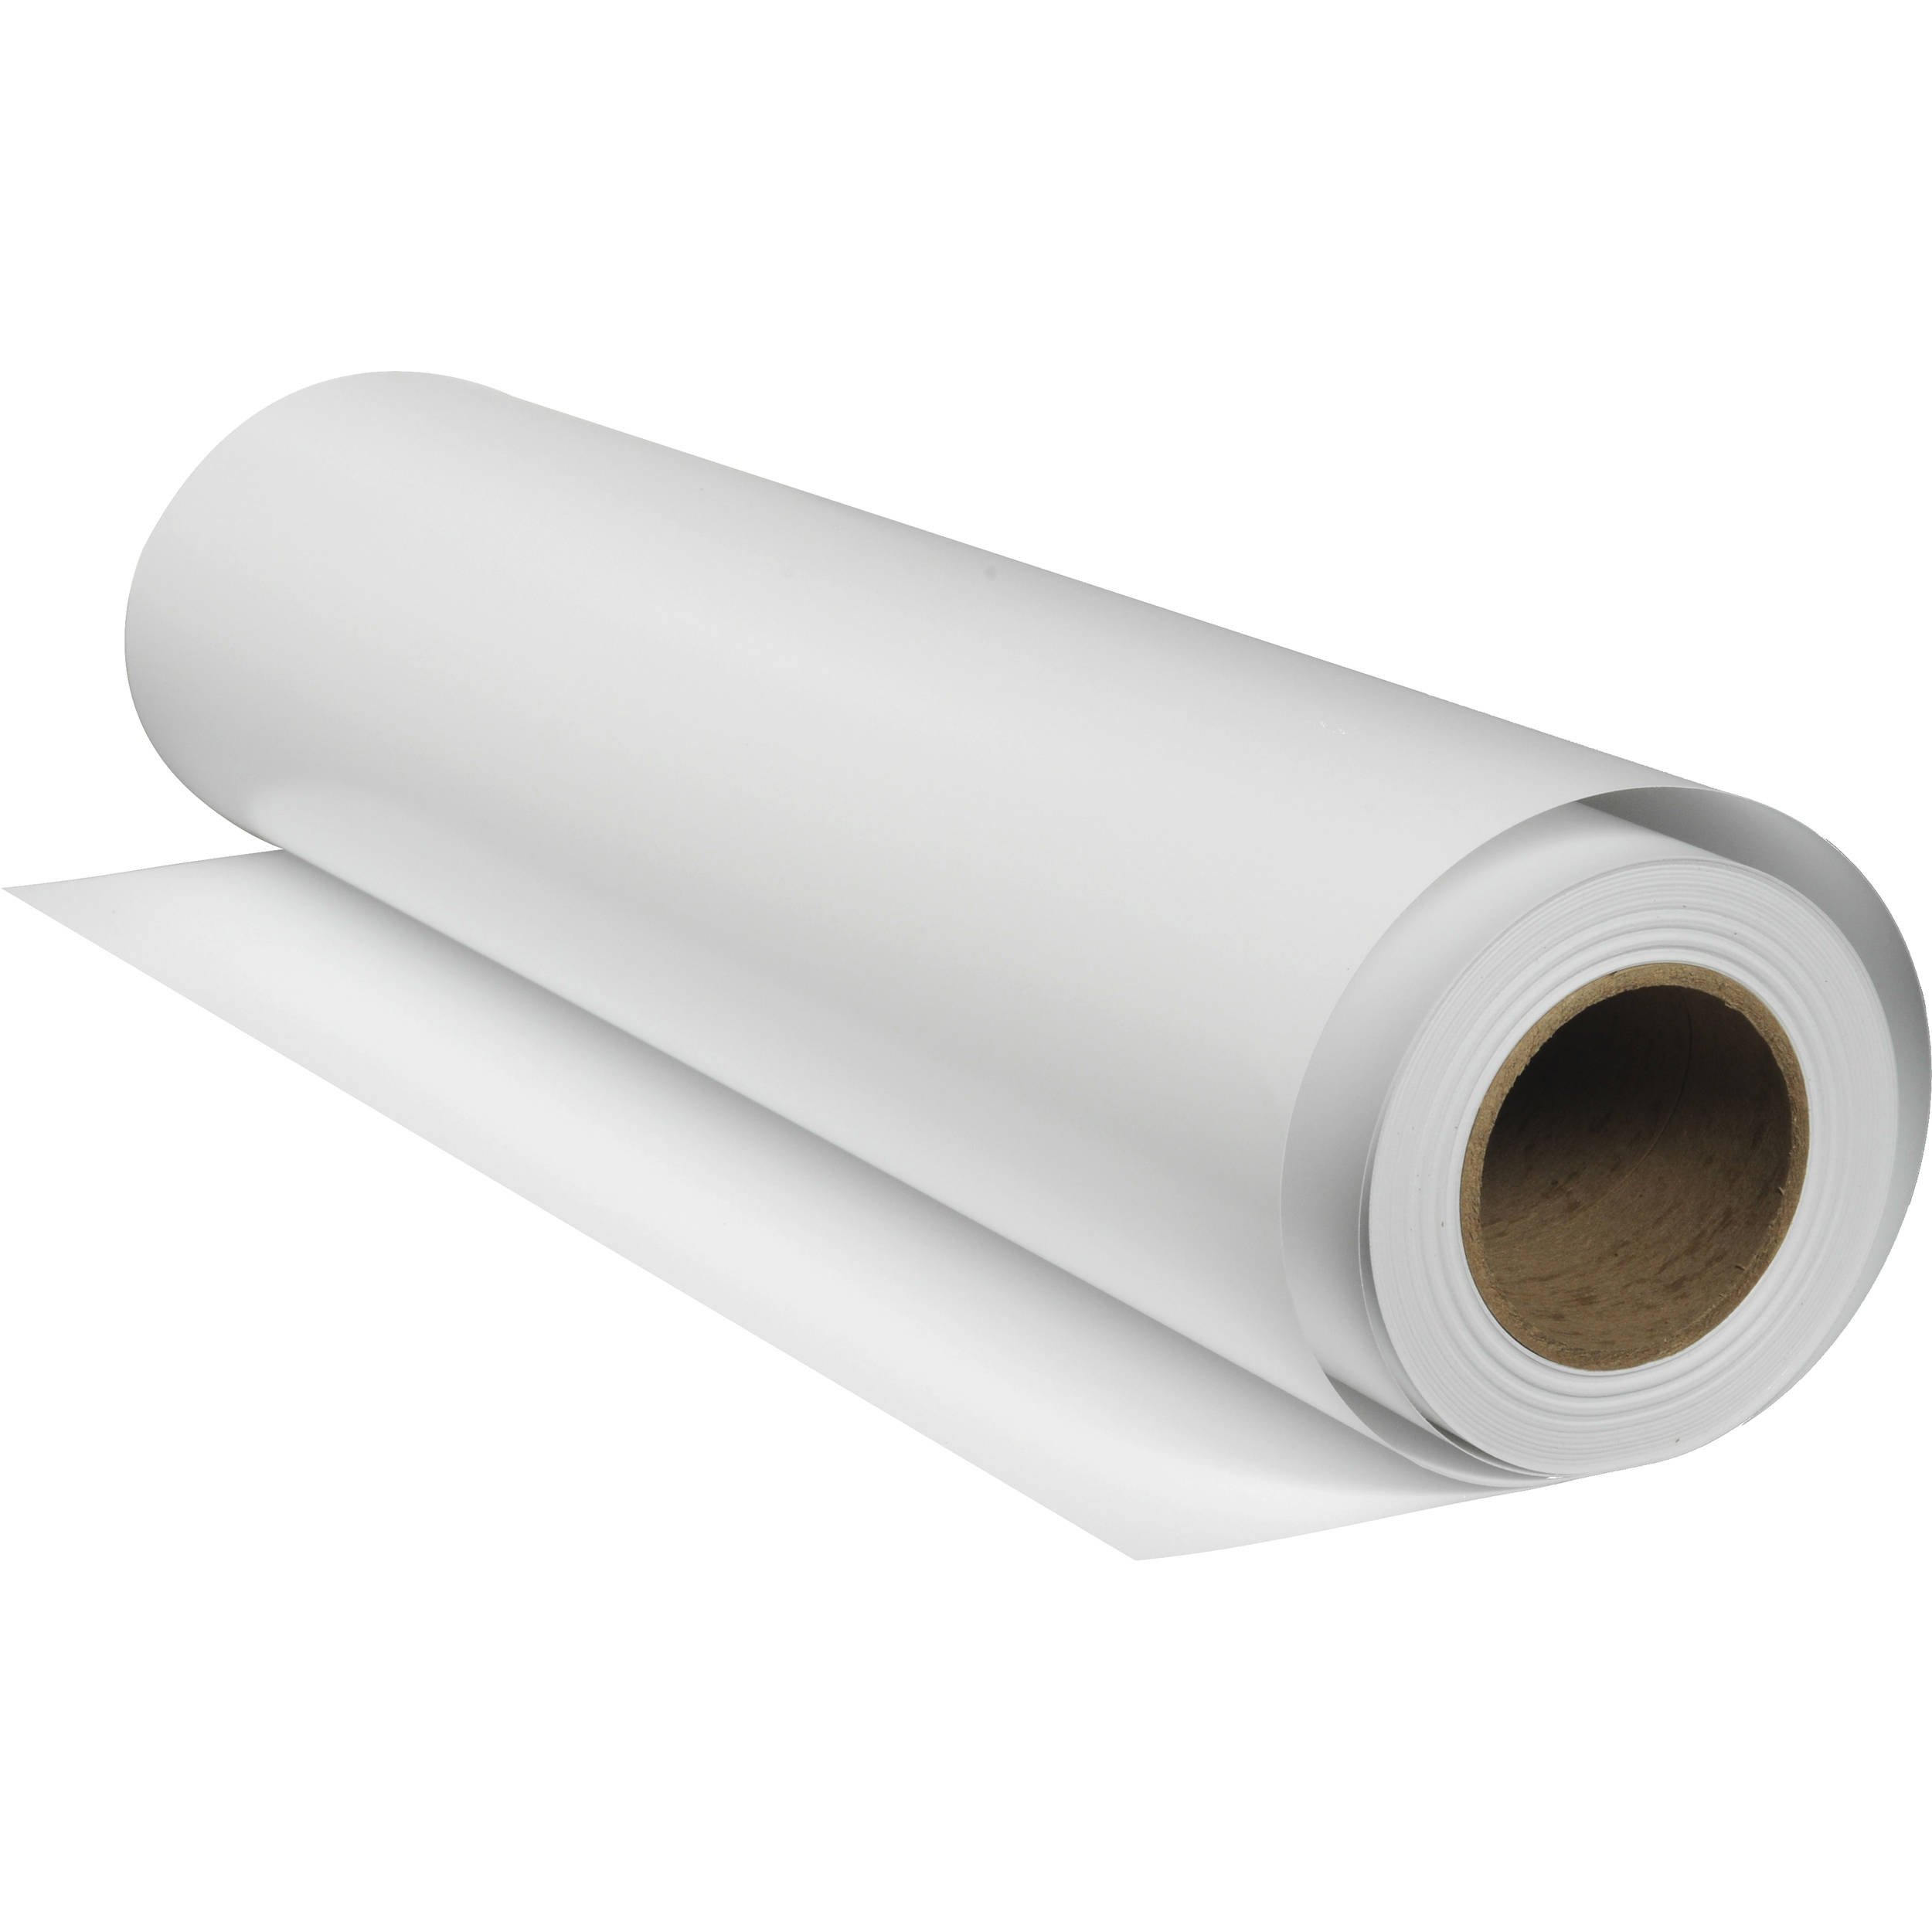 "Museo Silver Rag Paper (24"" x 50' Roll) 09910 B&H Photo"